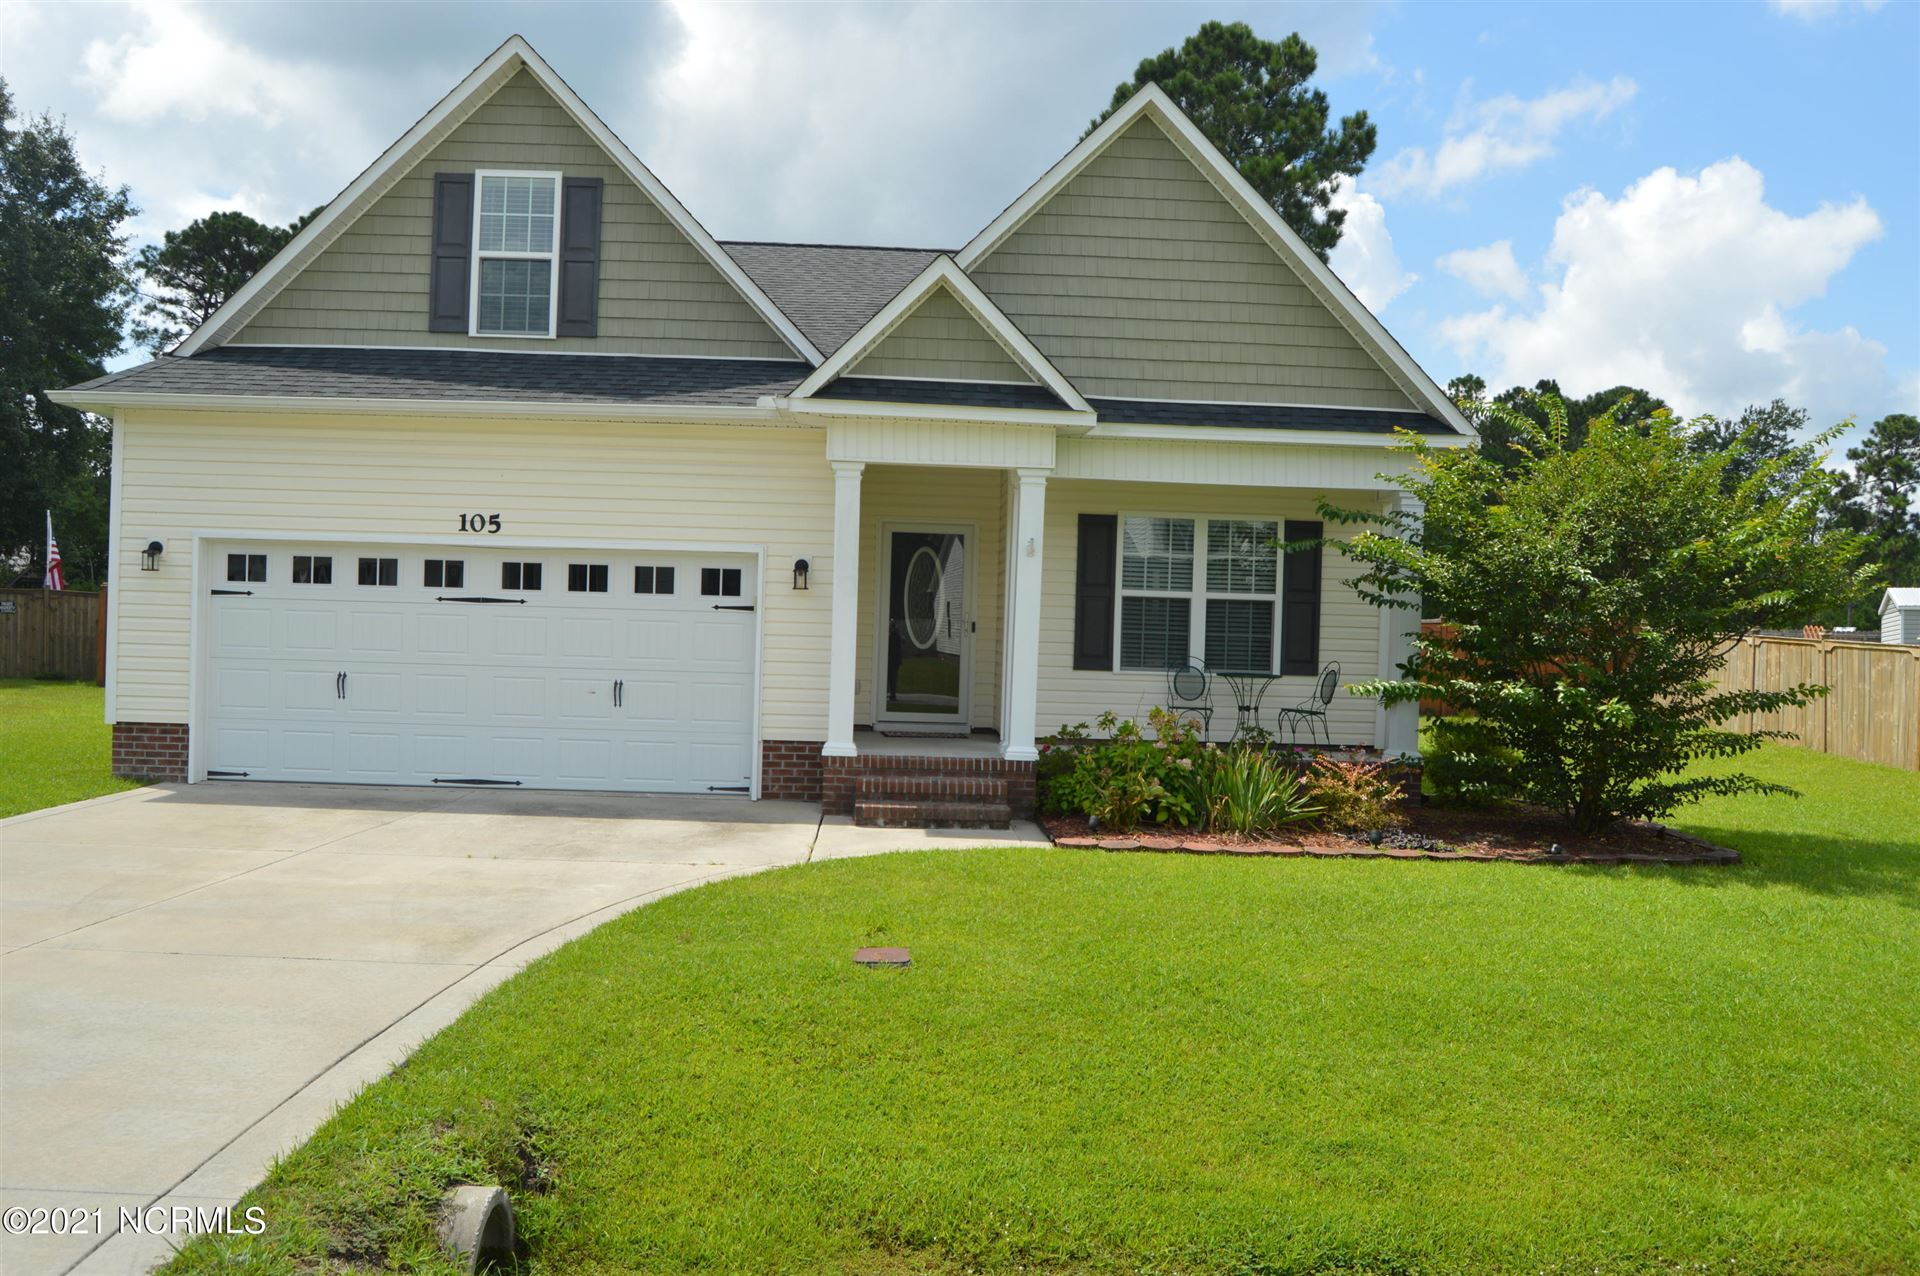 Photo of 105 Ridgepath Lane, Hubert, NC 28539 (MLS # 100287256)